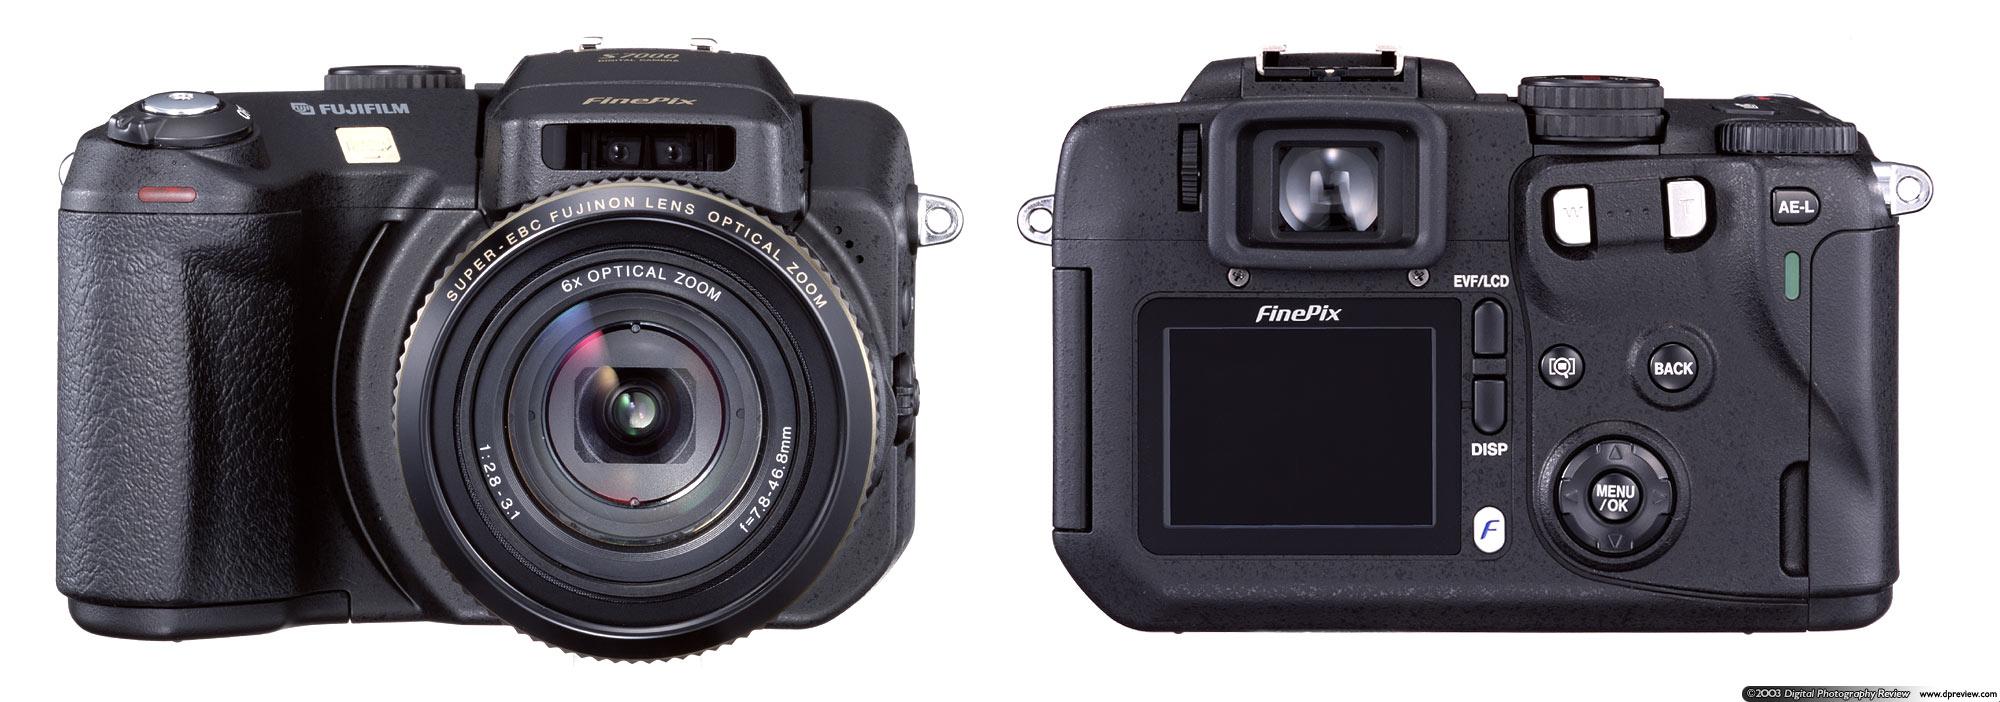 fujifilm finepix s7000 zoom 6 mp sensor digital photography review rh dpreview com Fuji FinePix S7000 Digital Camera Fujifilm FinePix S7000 Review